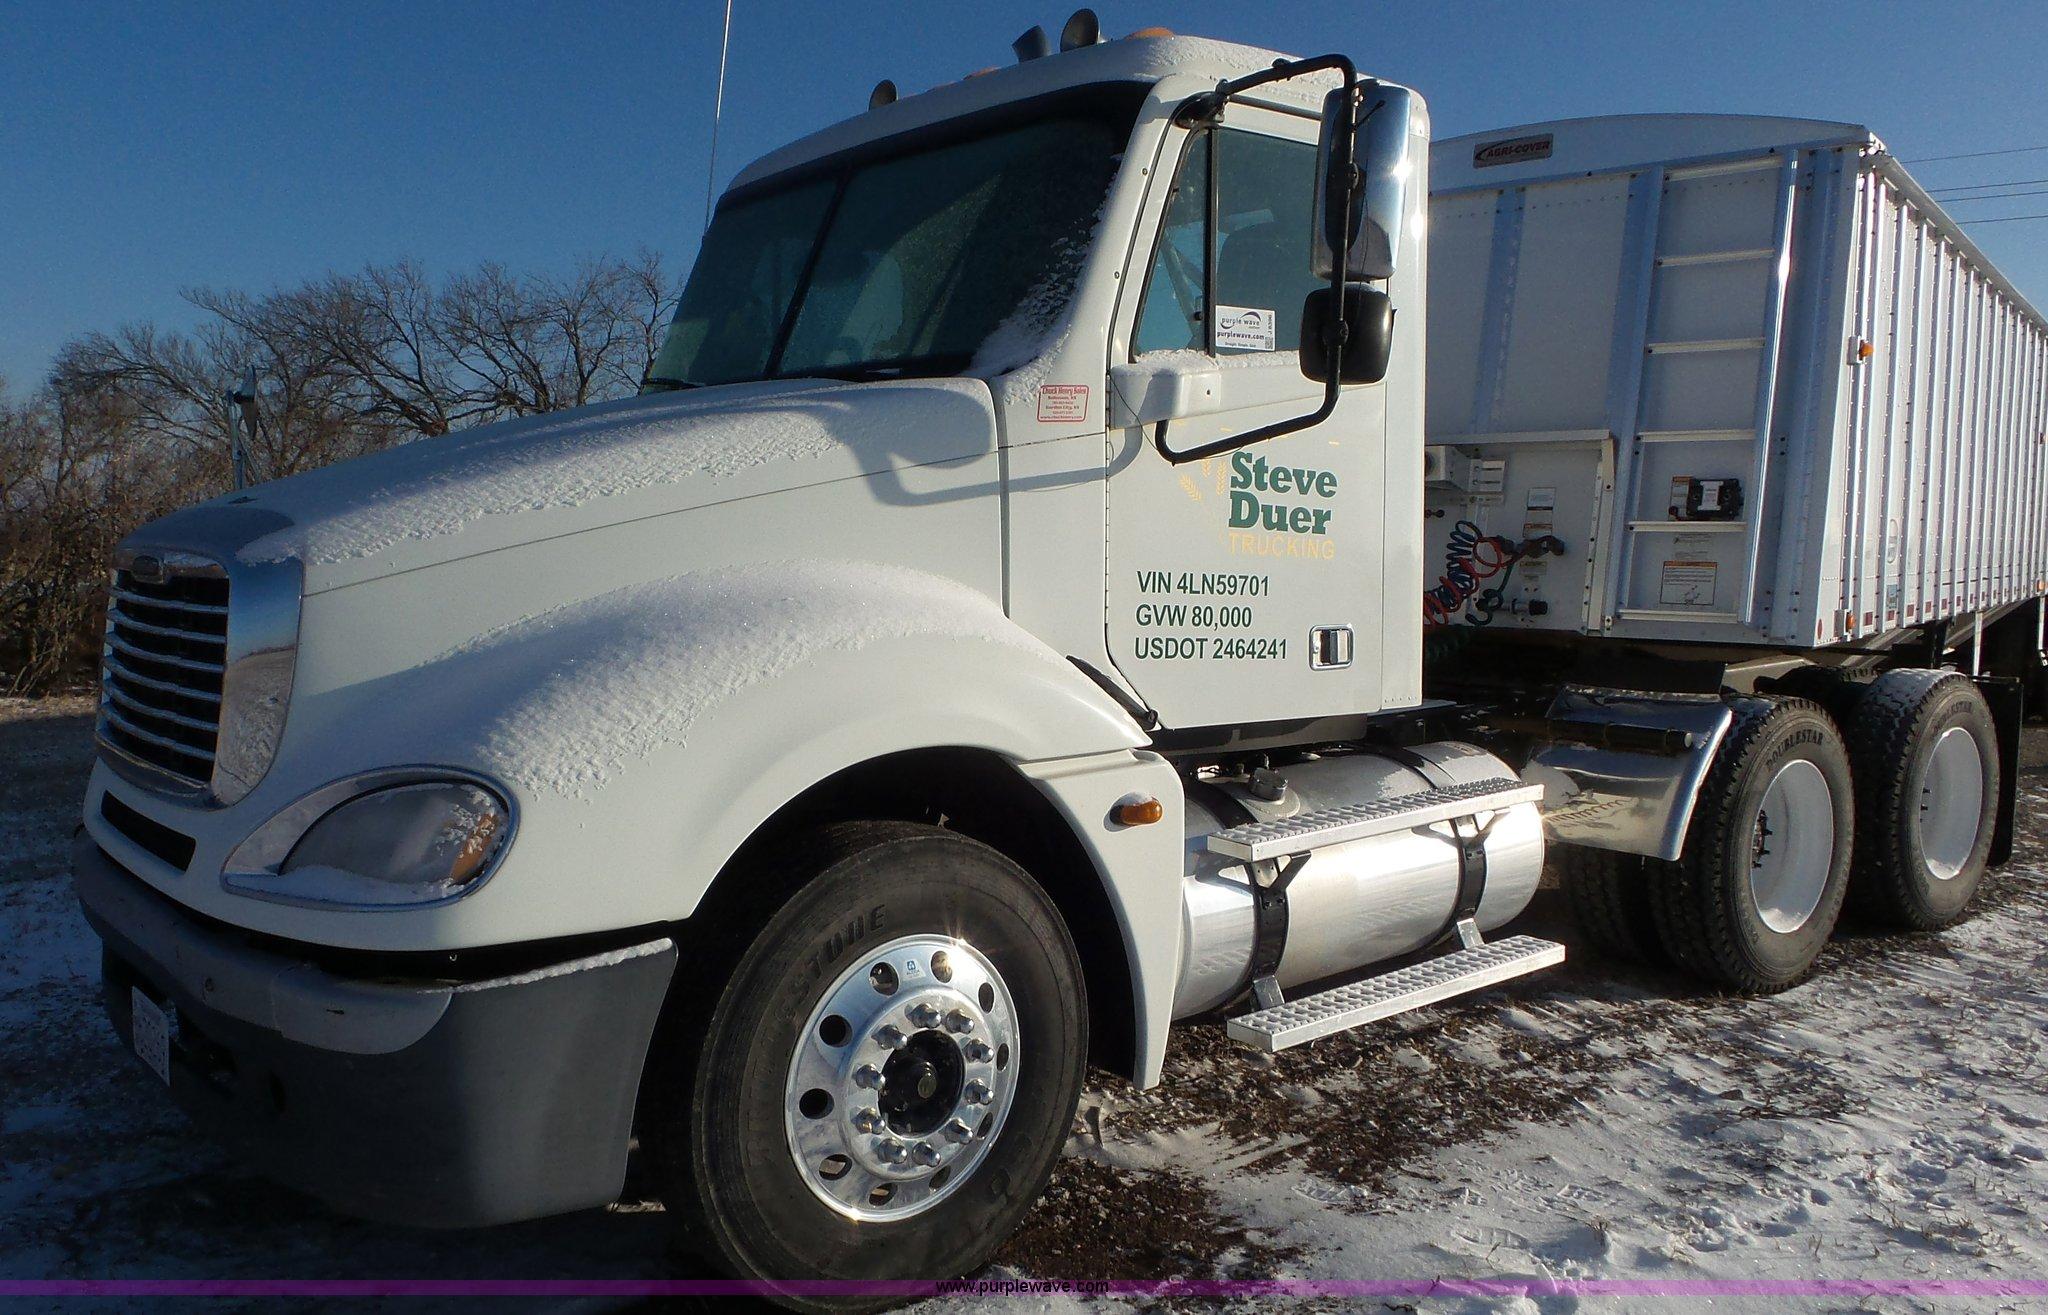 2004 Freightliner Columbia Semi Truck Item J8396 Sold J Fuel Filter For 04 14 0l Frieghtliner Full Size In New Window